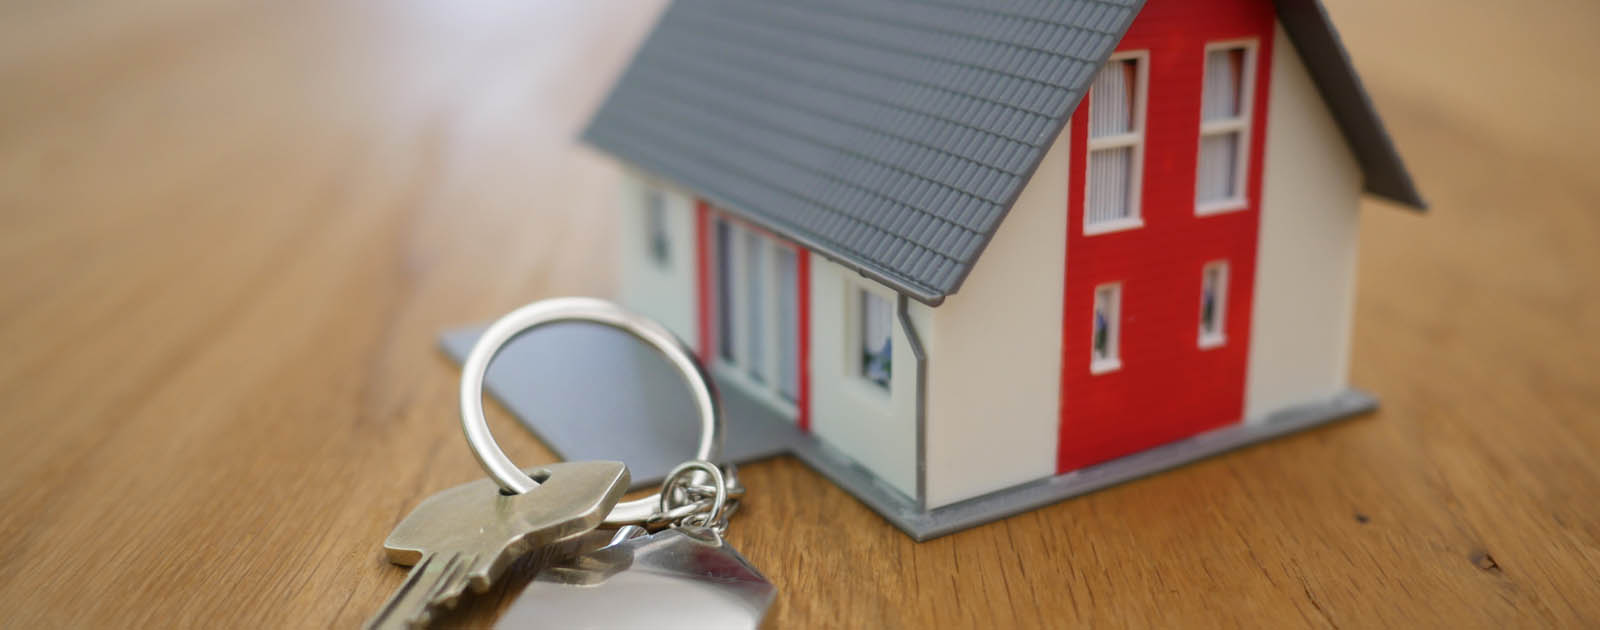 Germantown Plans Flat Property Tax